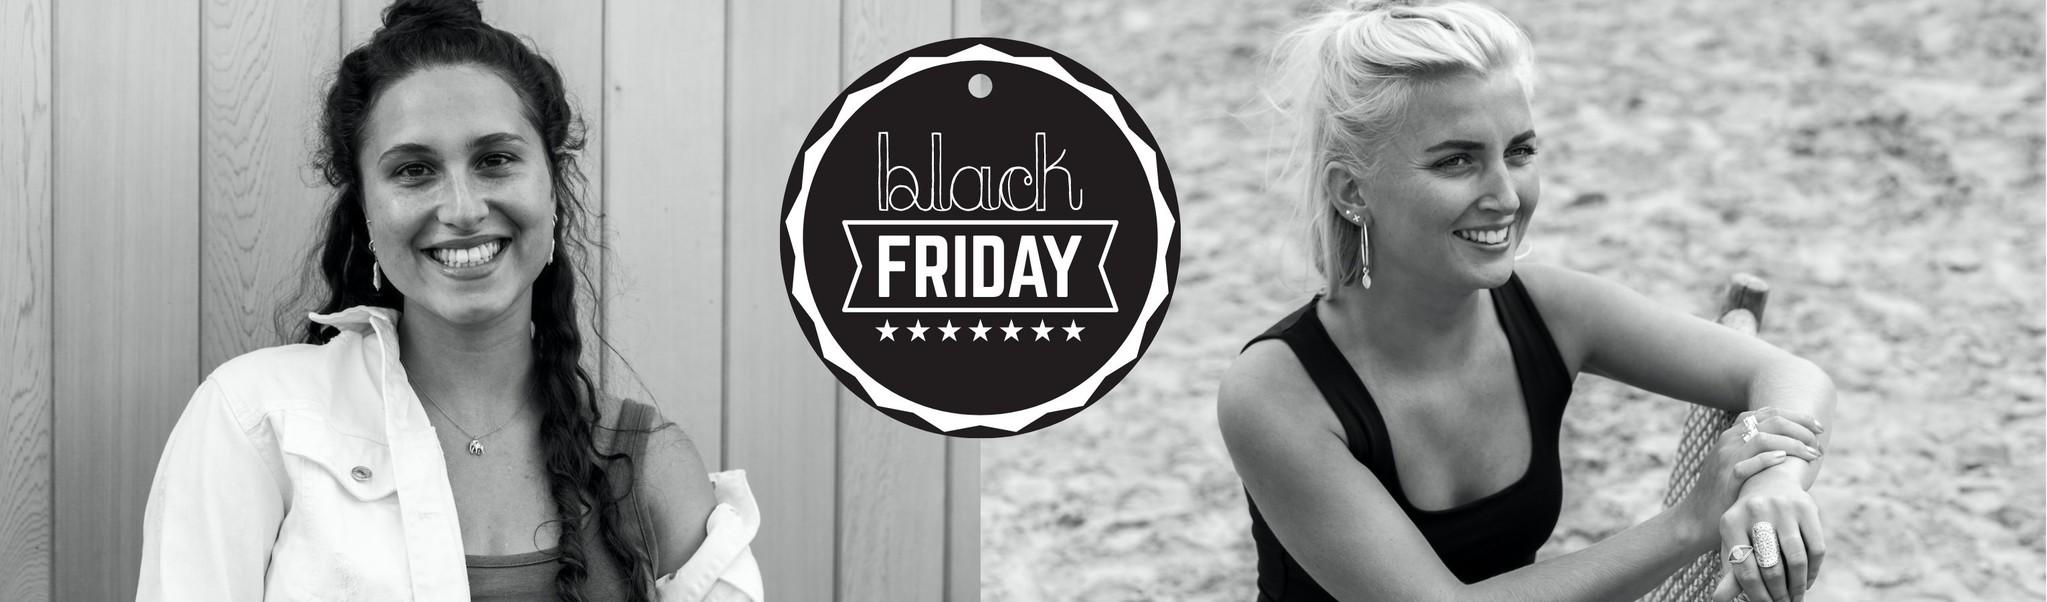 Black Friday 4